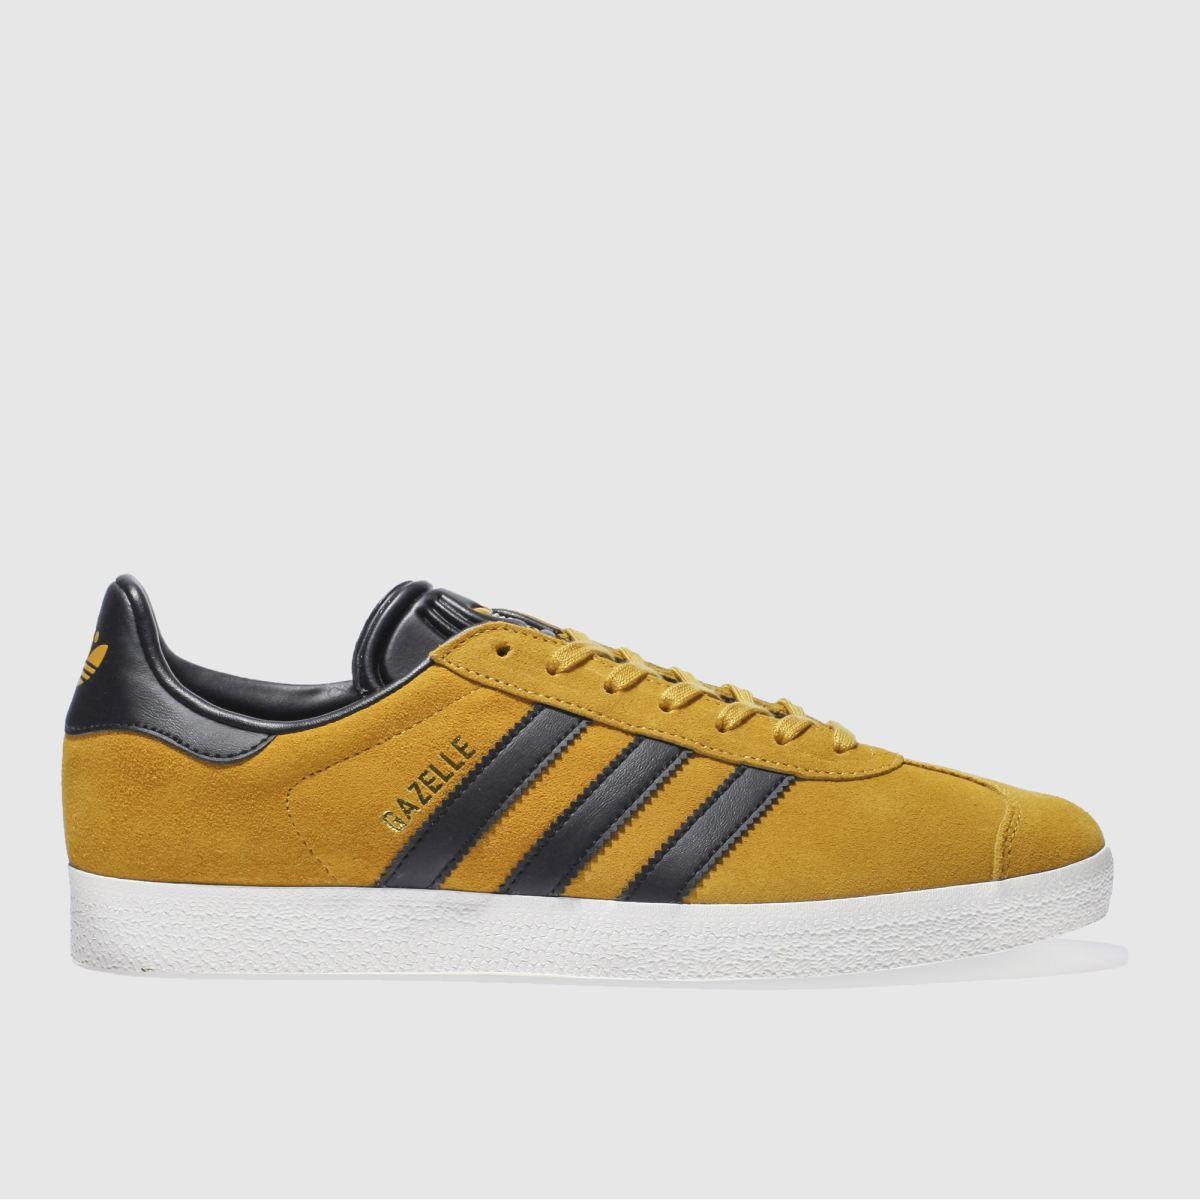 adidas yellow gazelle trainers